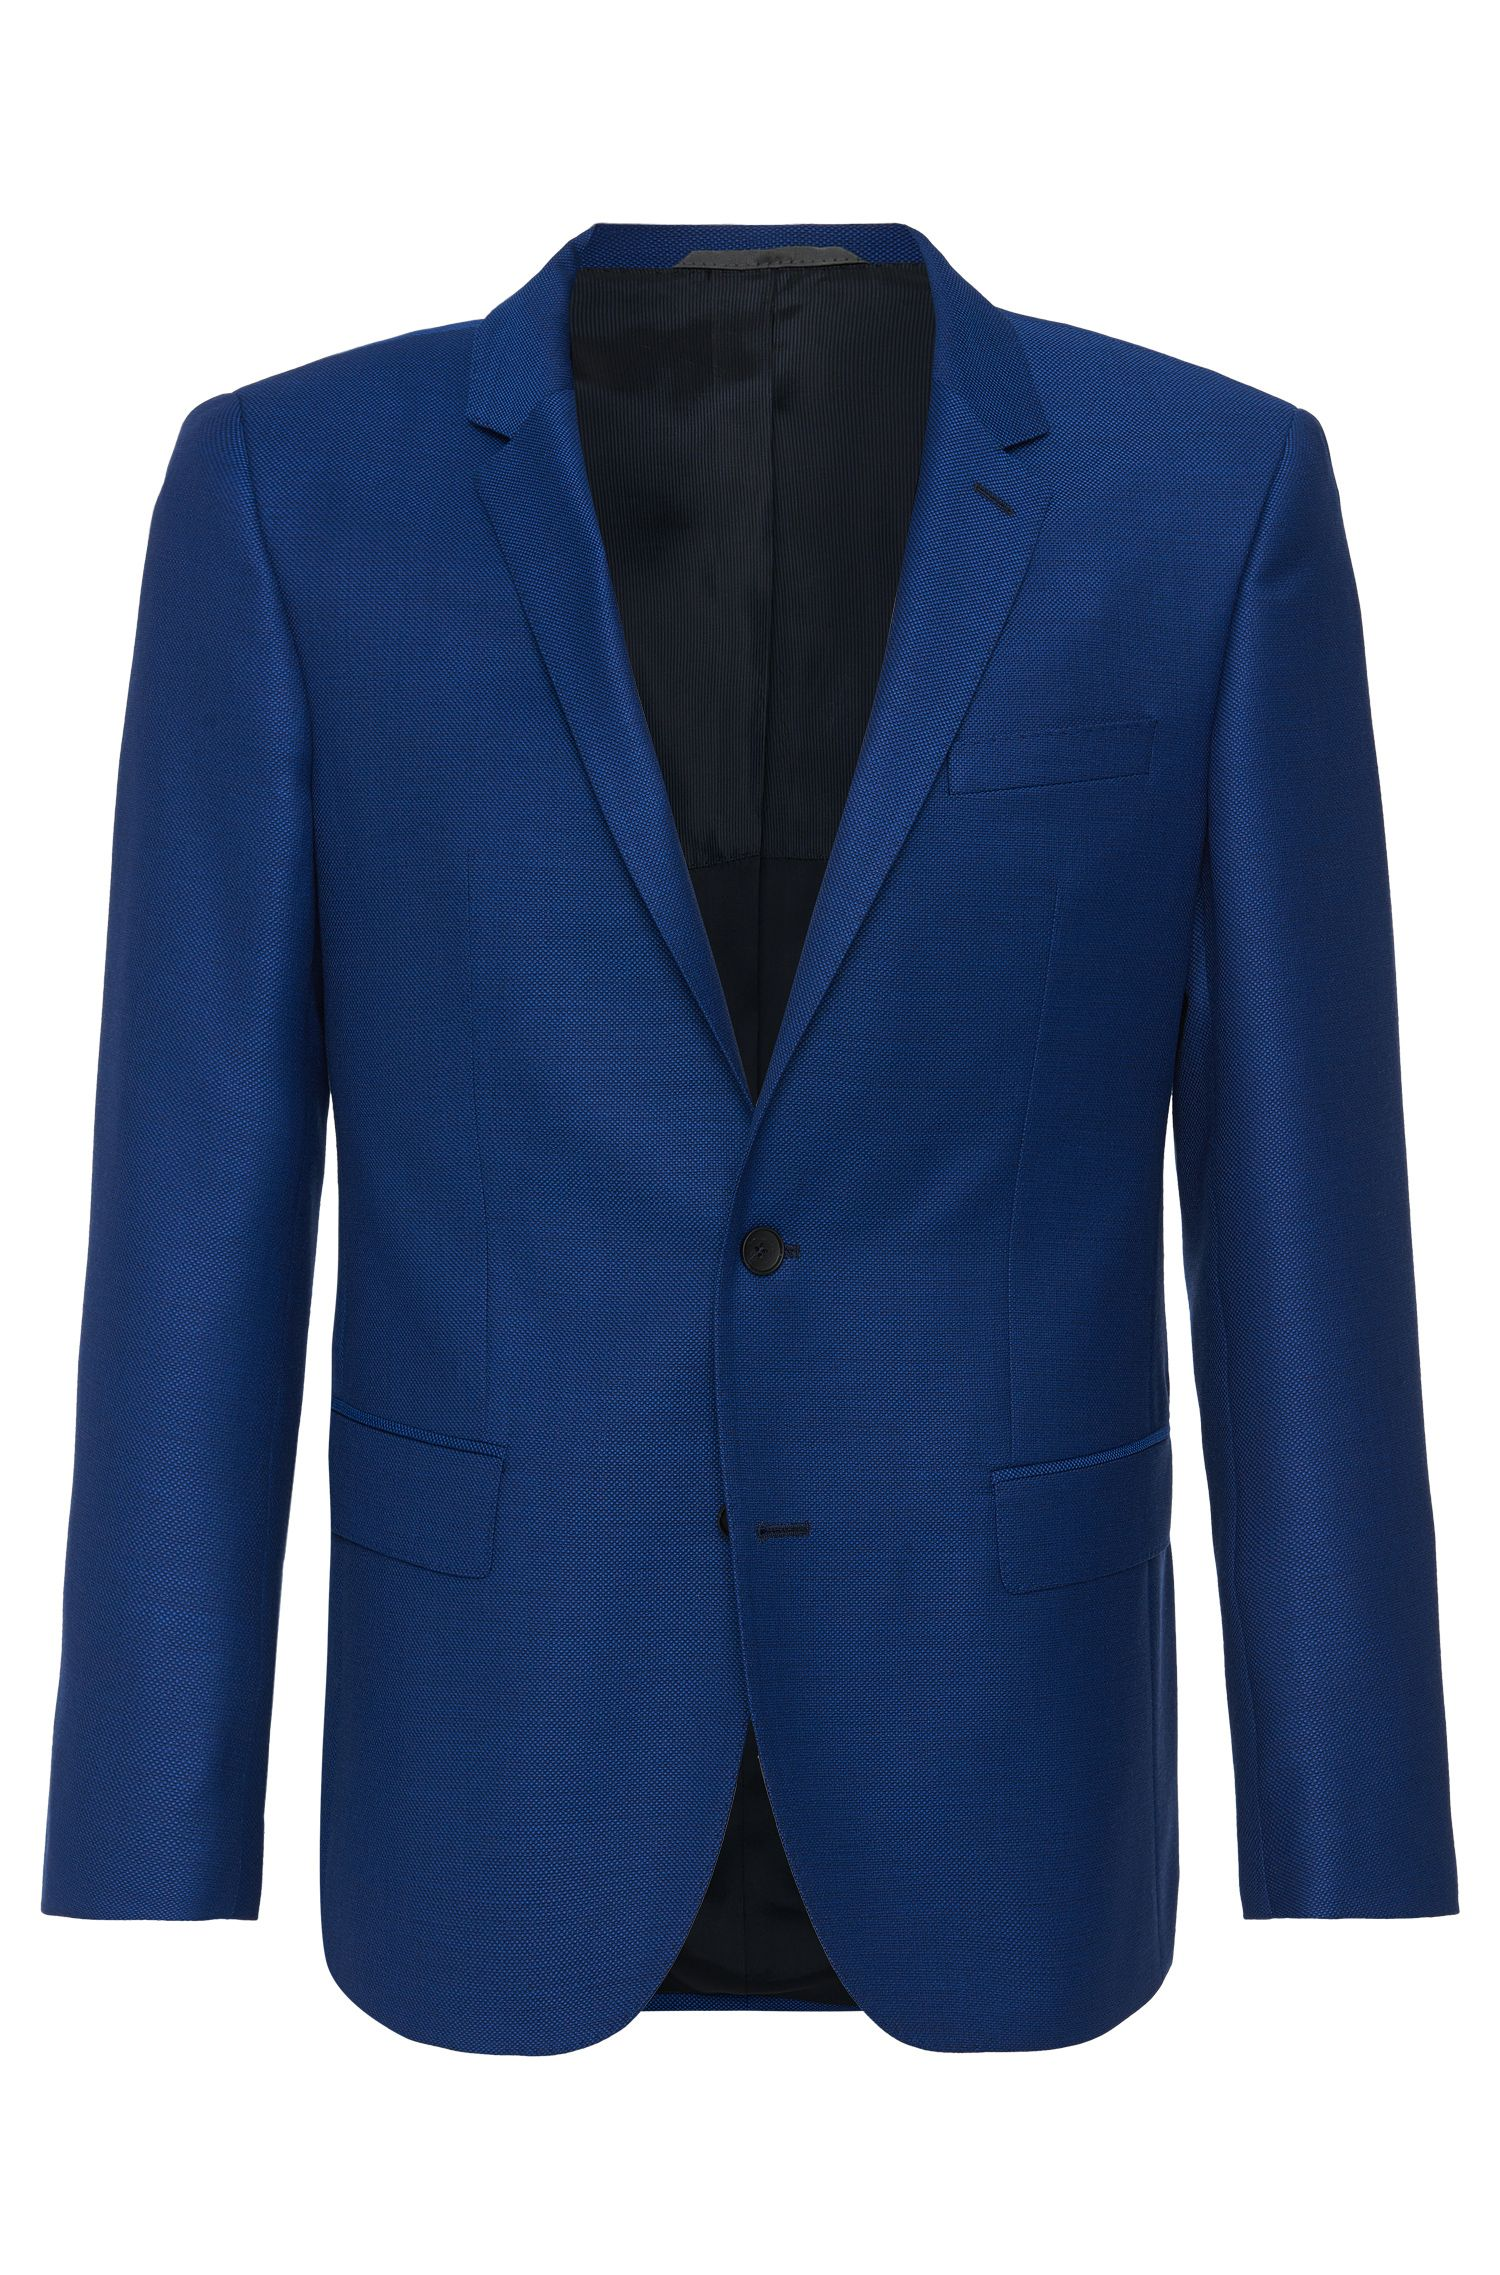 'Hutch' | Slim Fit, Italian Virgin Wool Sport Coat